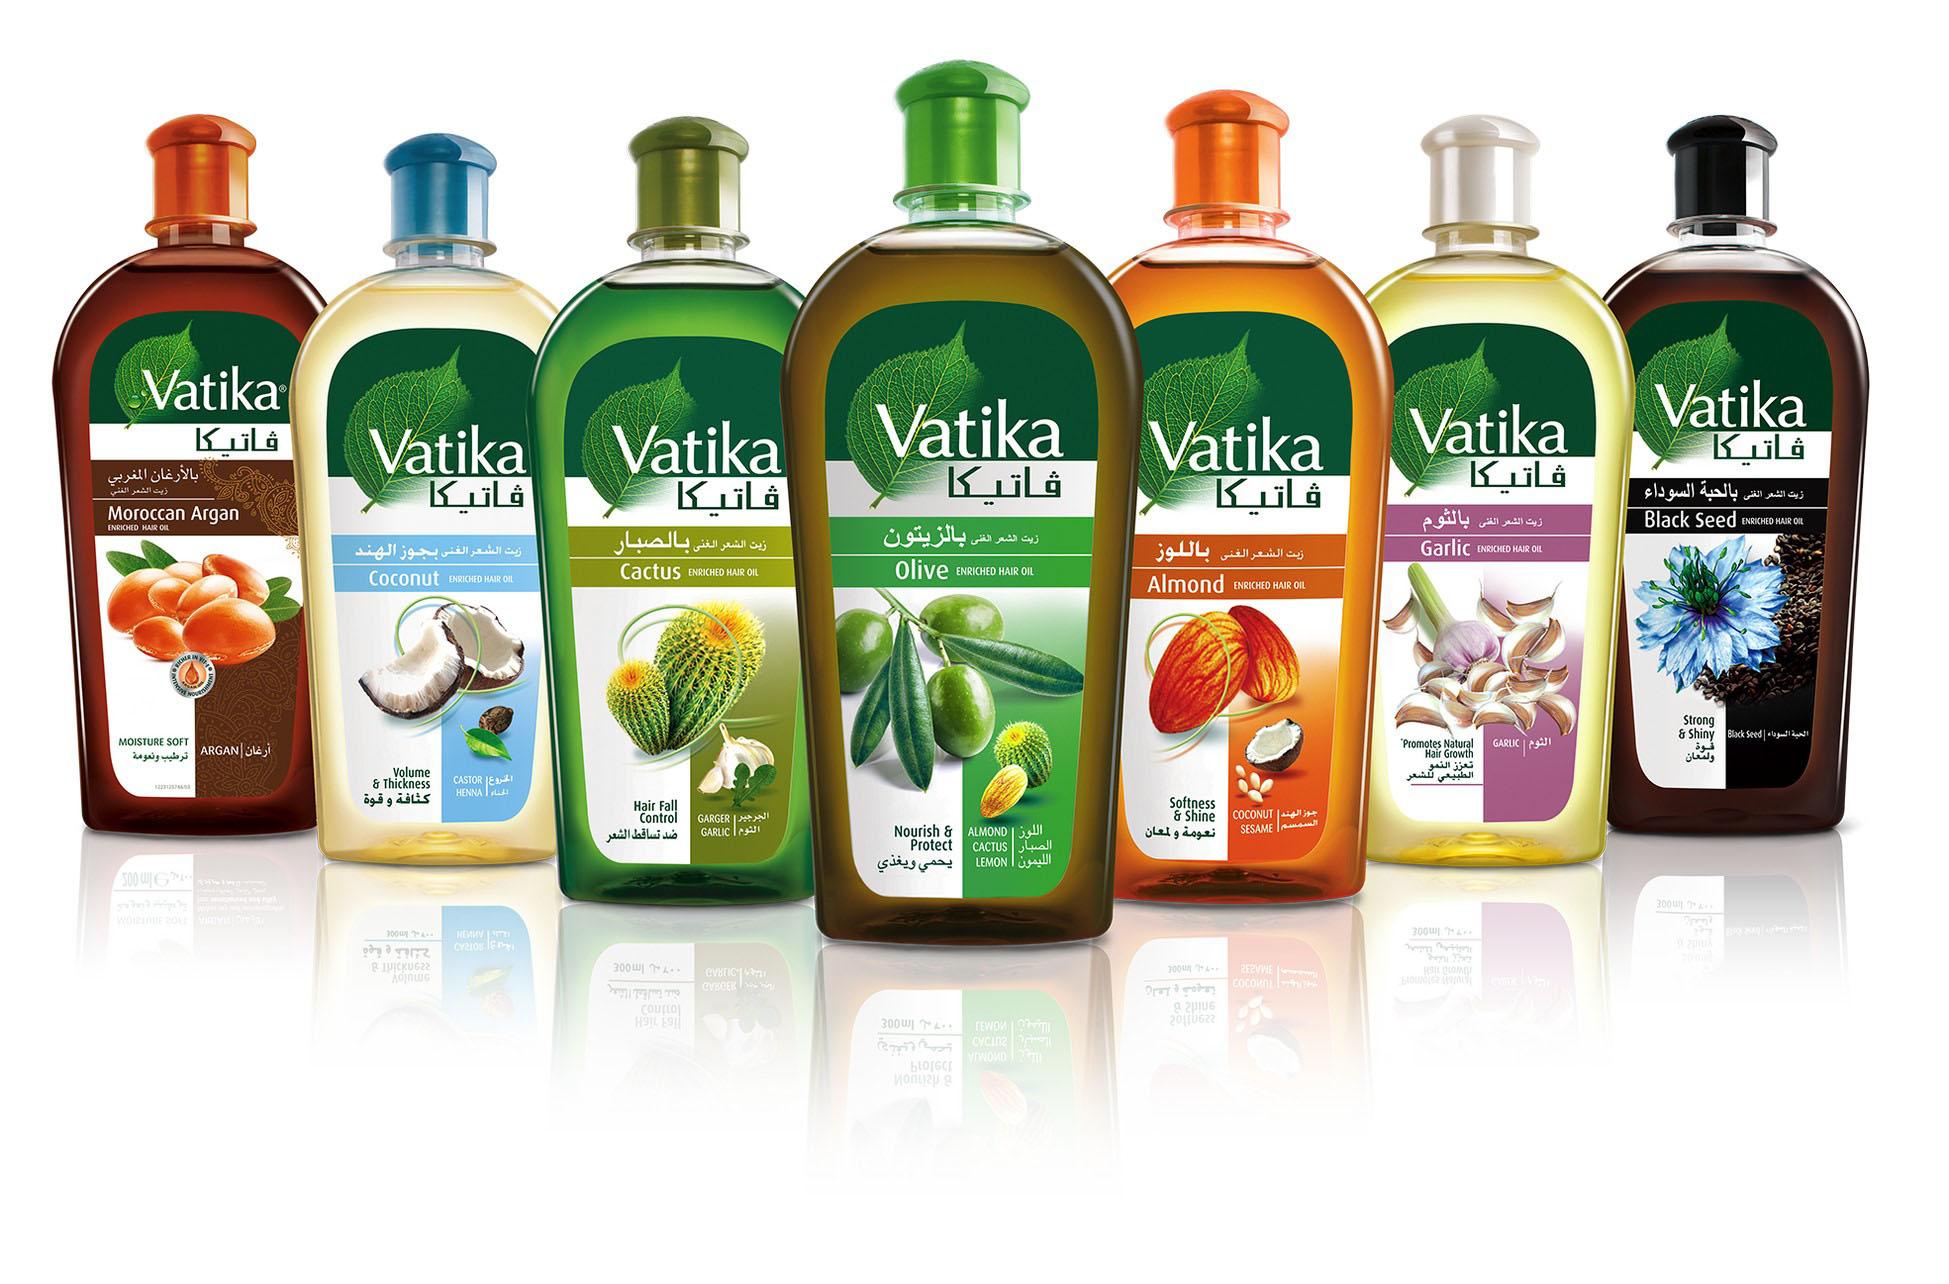 Dabur International S Flagship Brand Vatika Enriched Hair